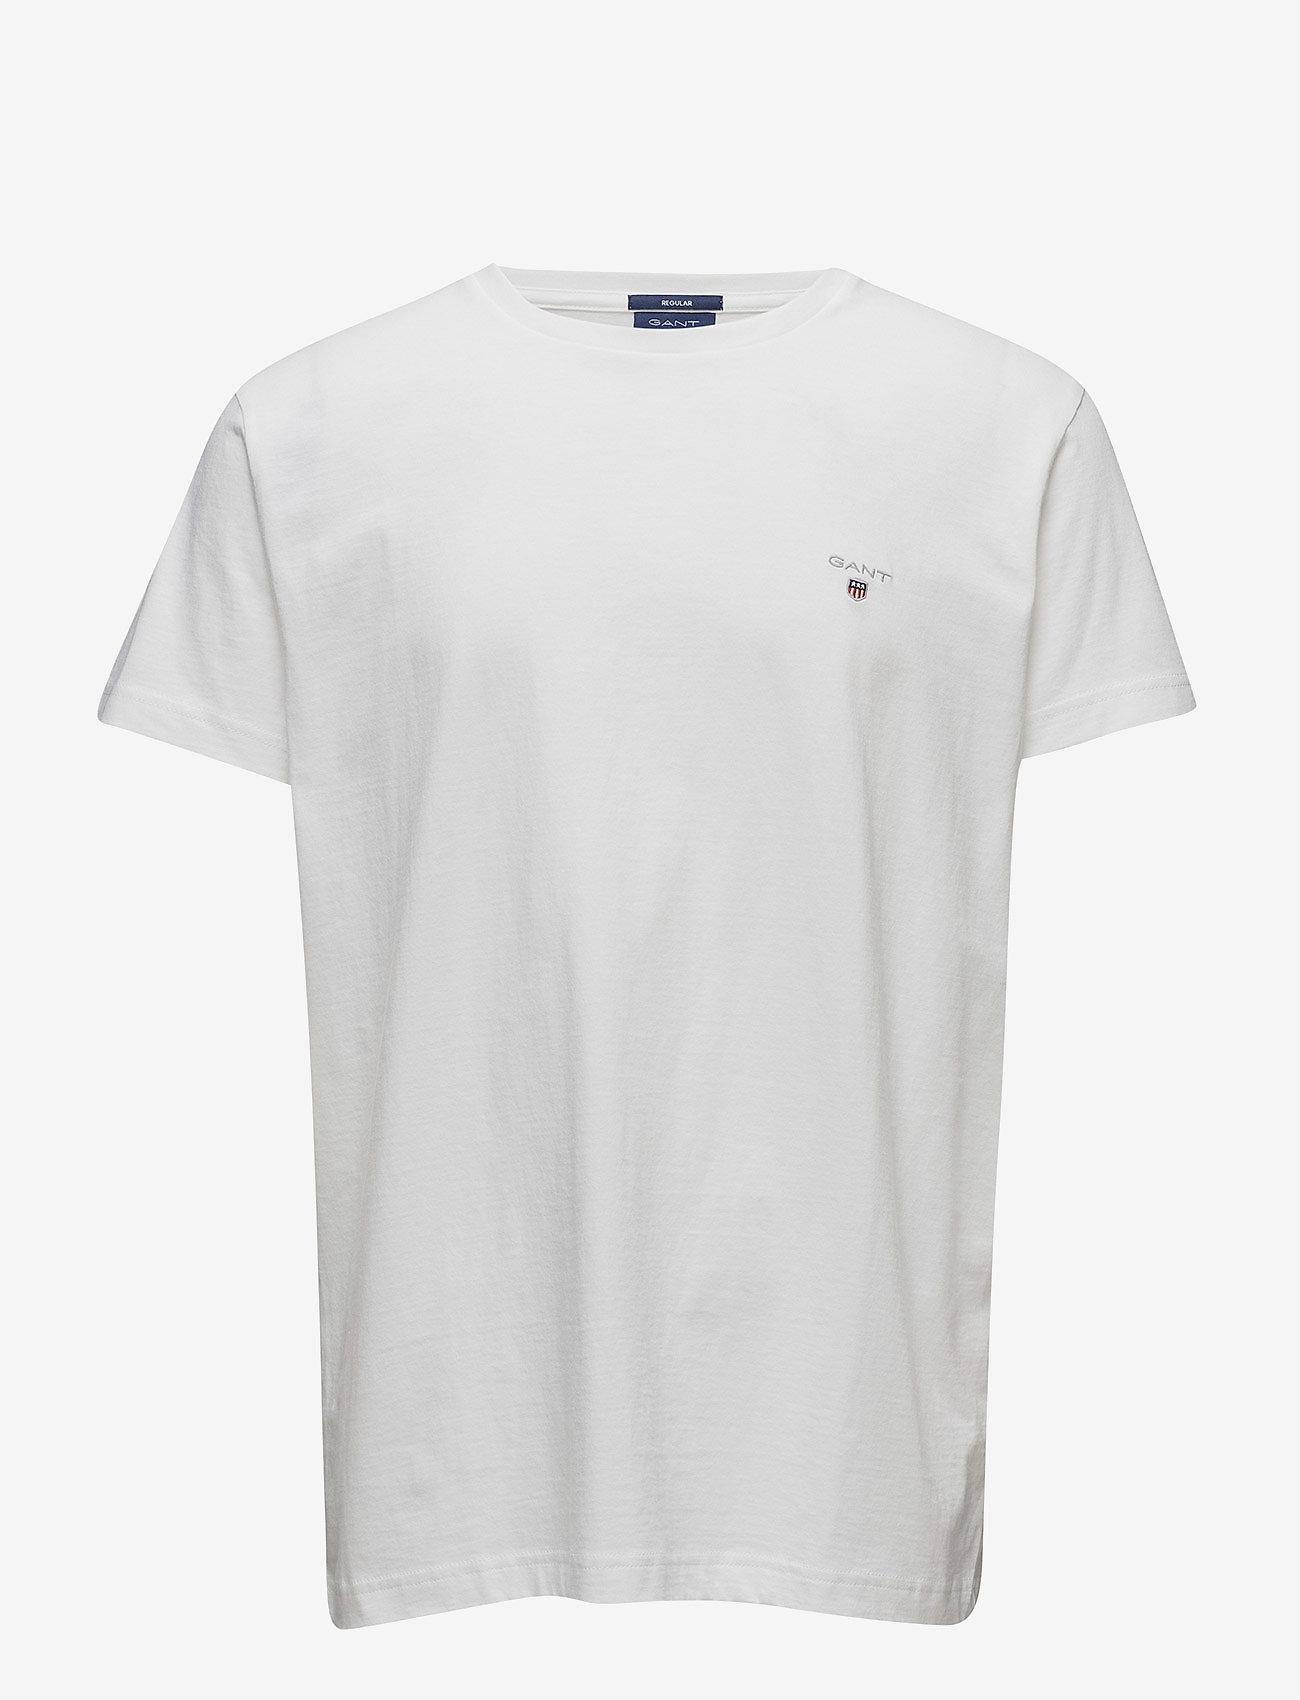 Gant - ORIGINAL SS T-SHIRT - krótki rękaw - white